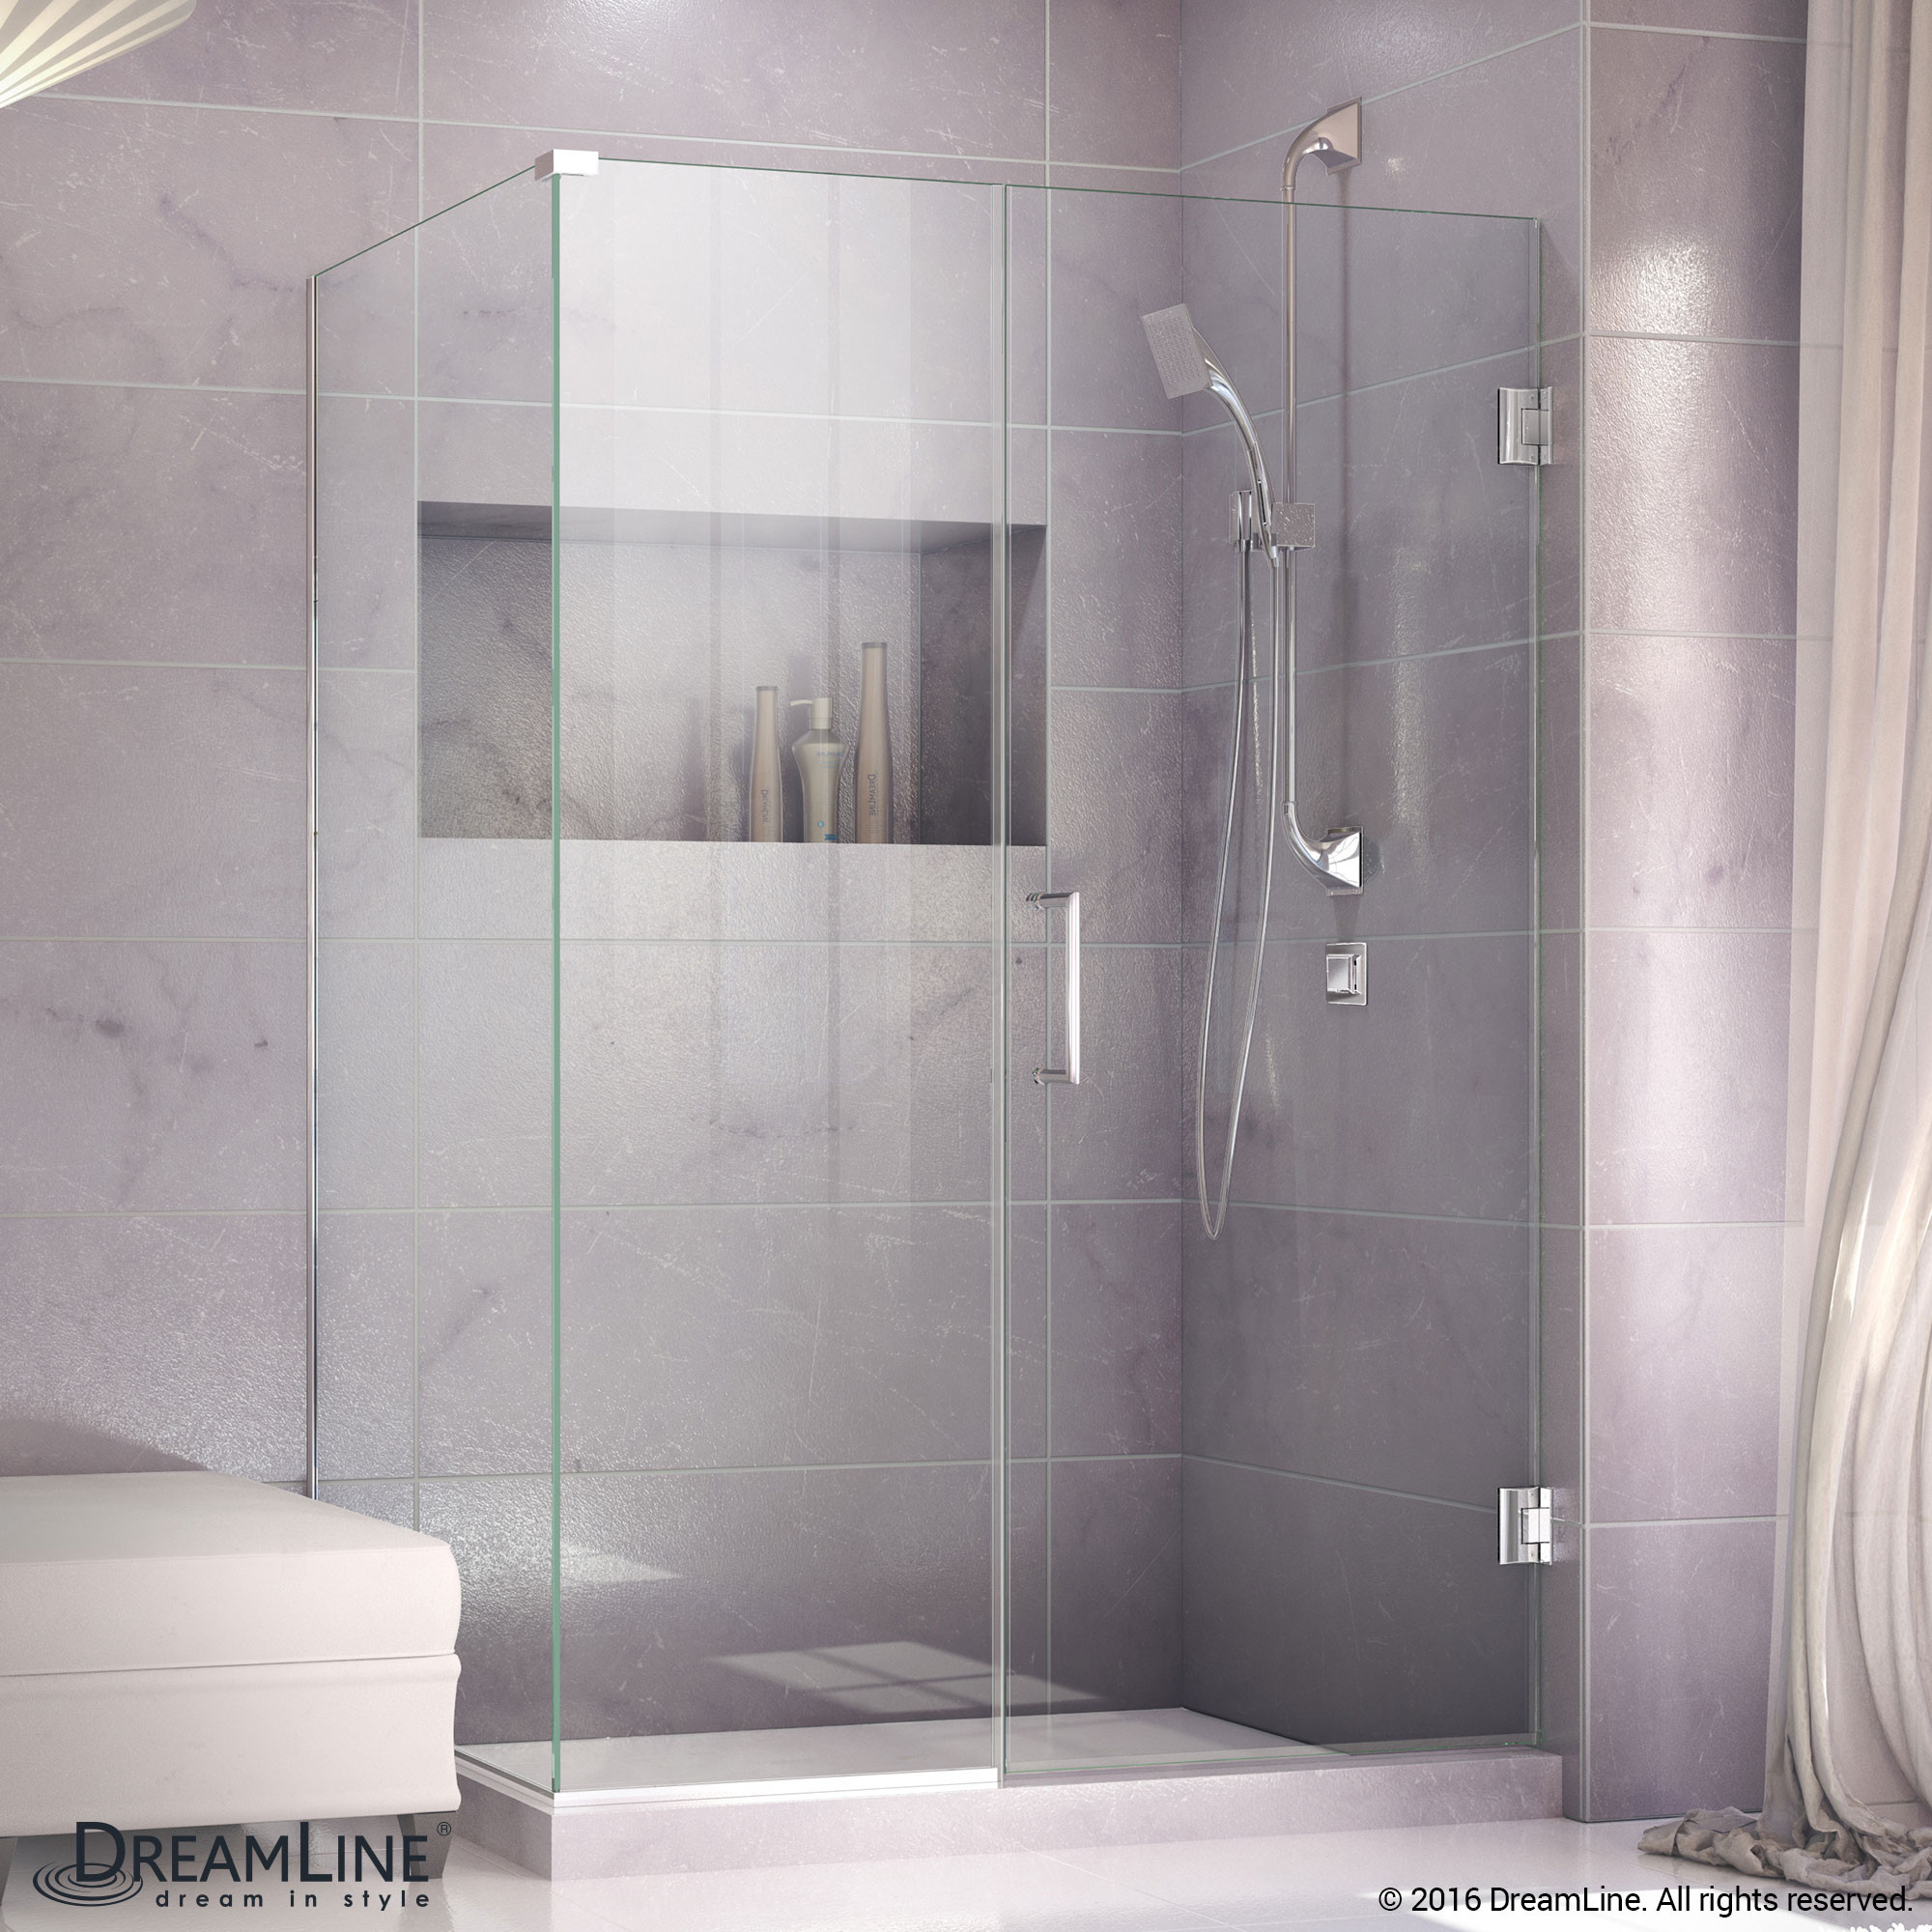 DreamLine SHEN-24435340-01 Unidoor Plus Hinged Shower Enclosure In Chrome Finish Hardware